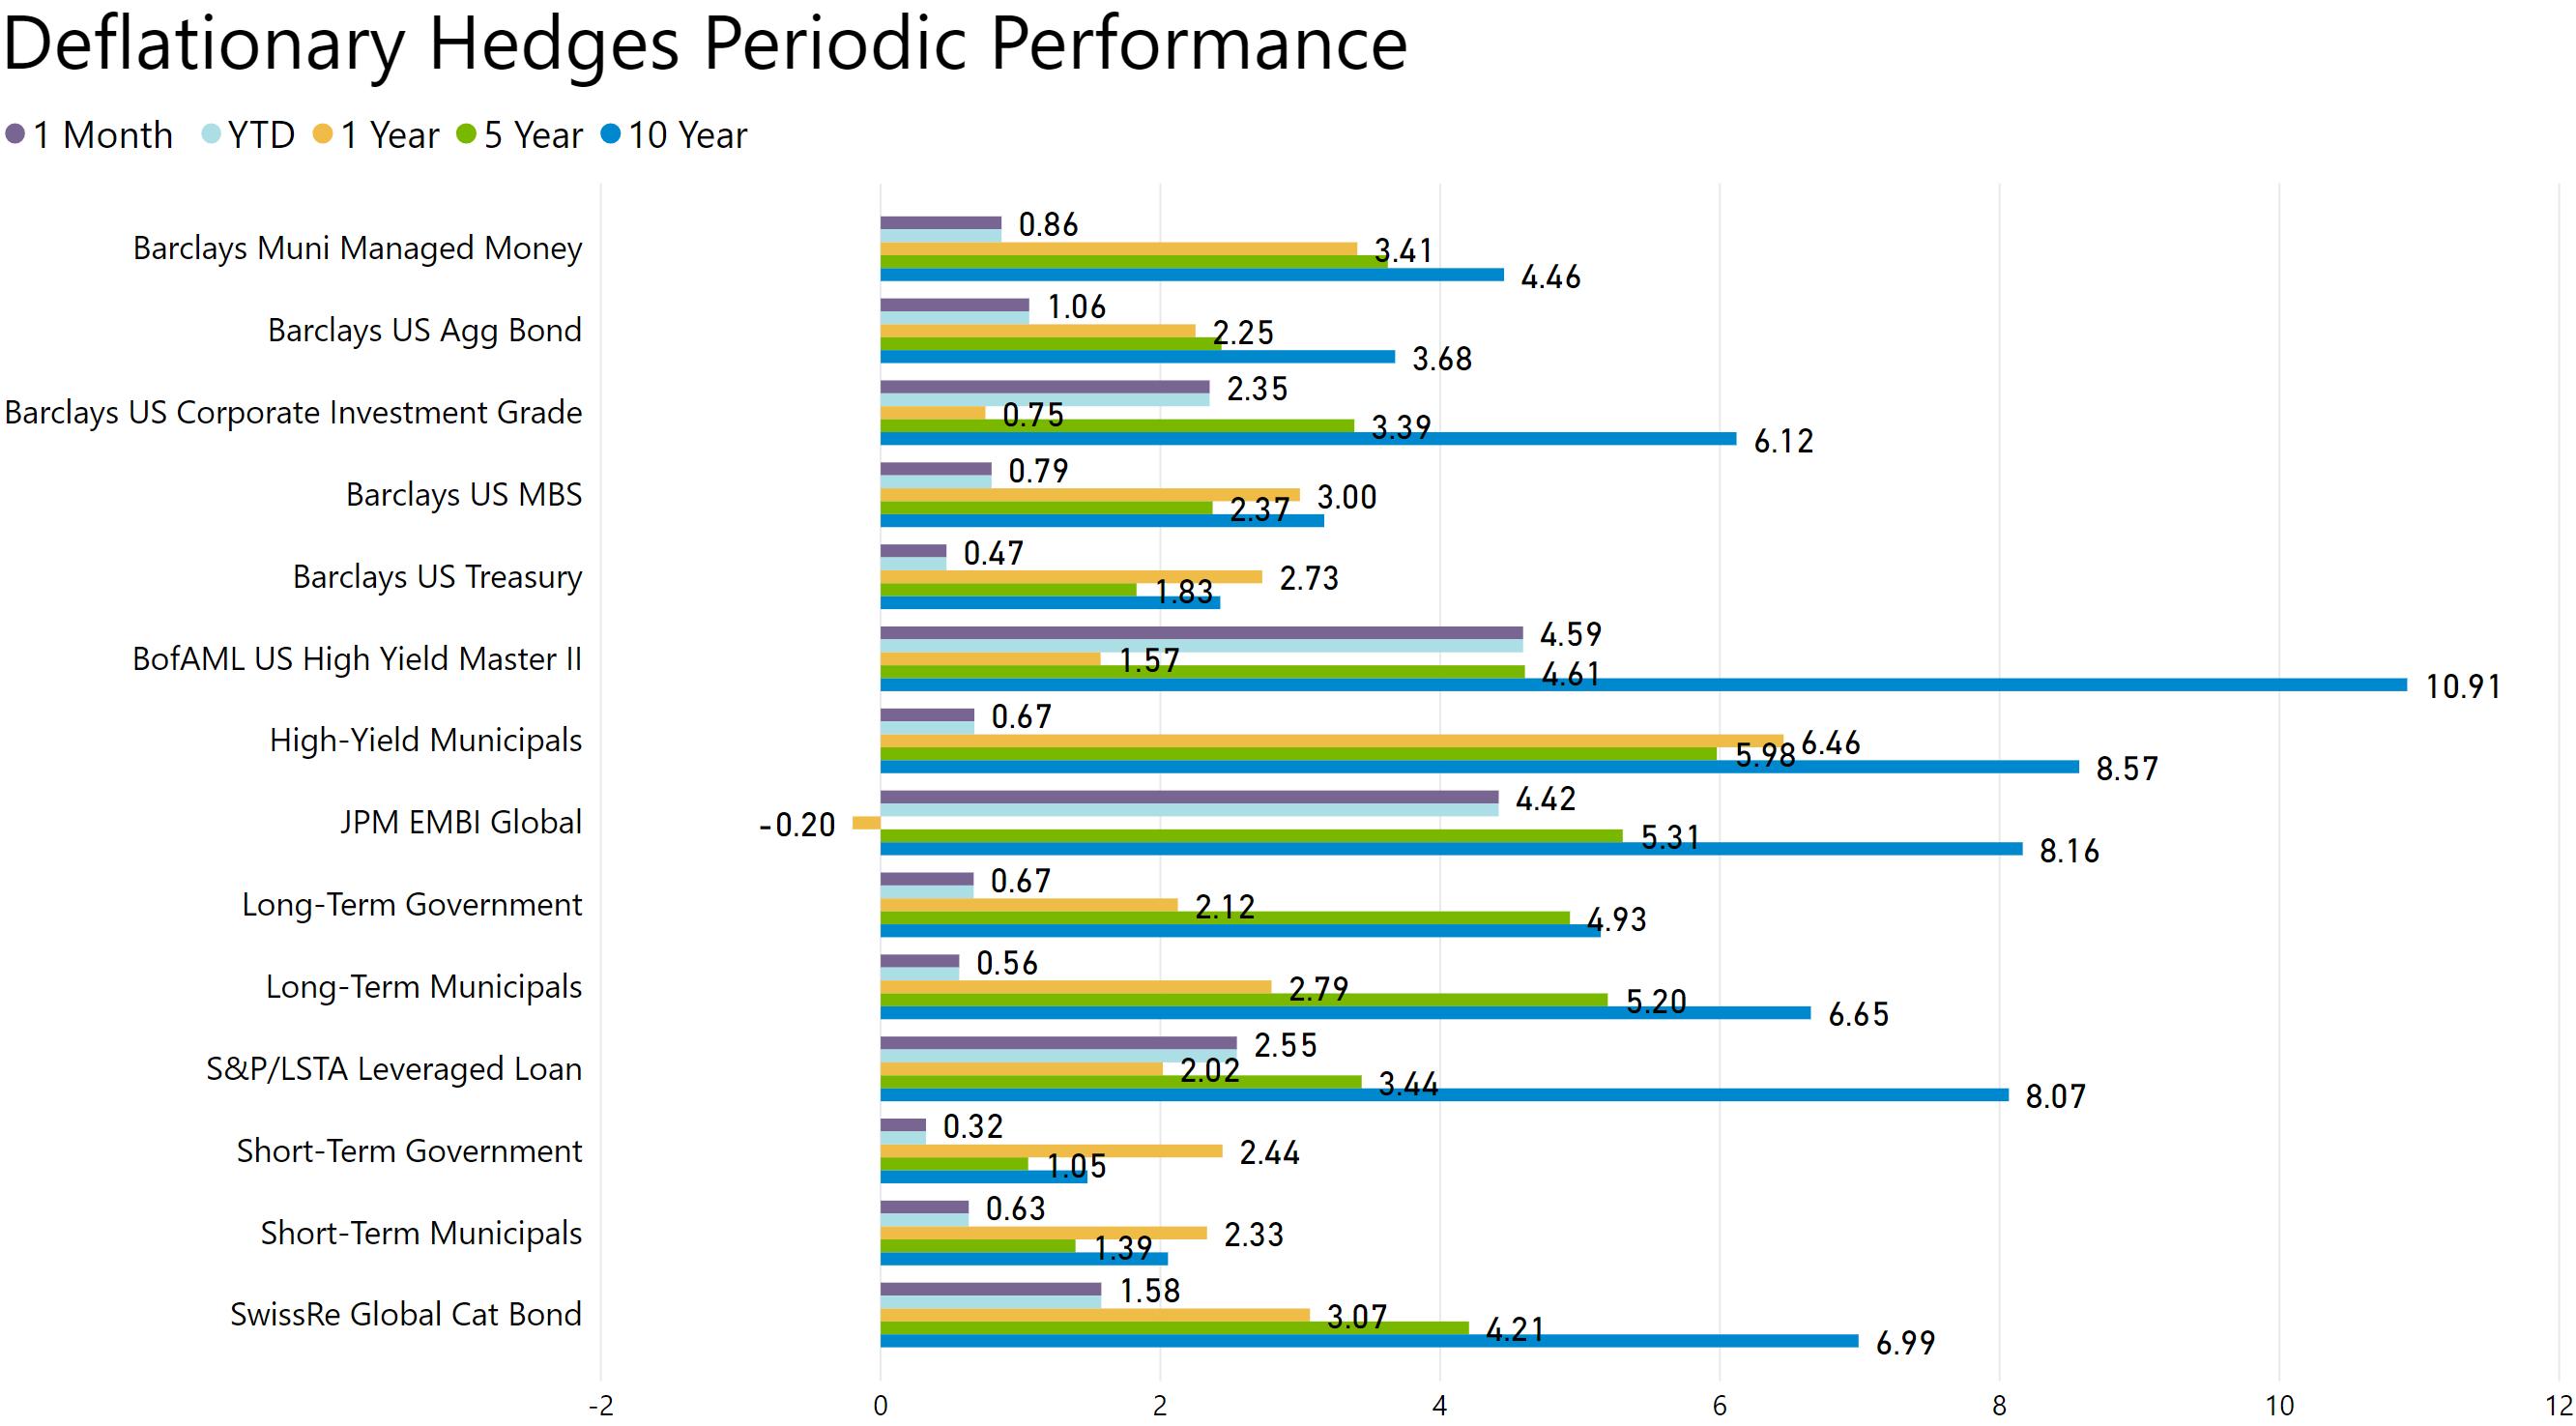 deflationary hedges performance